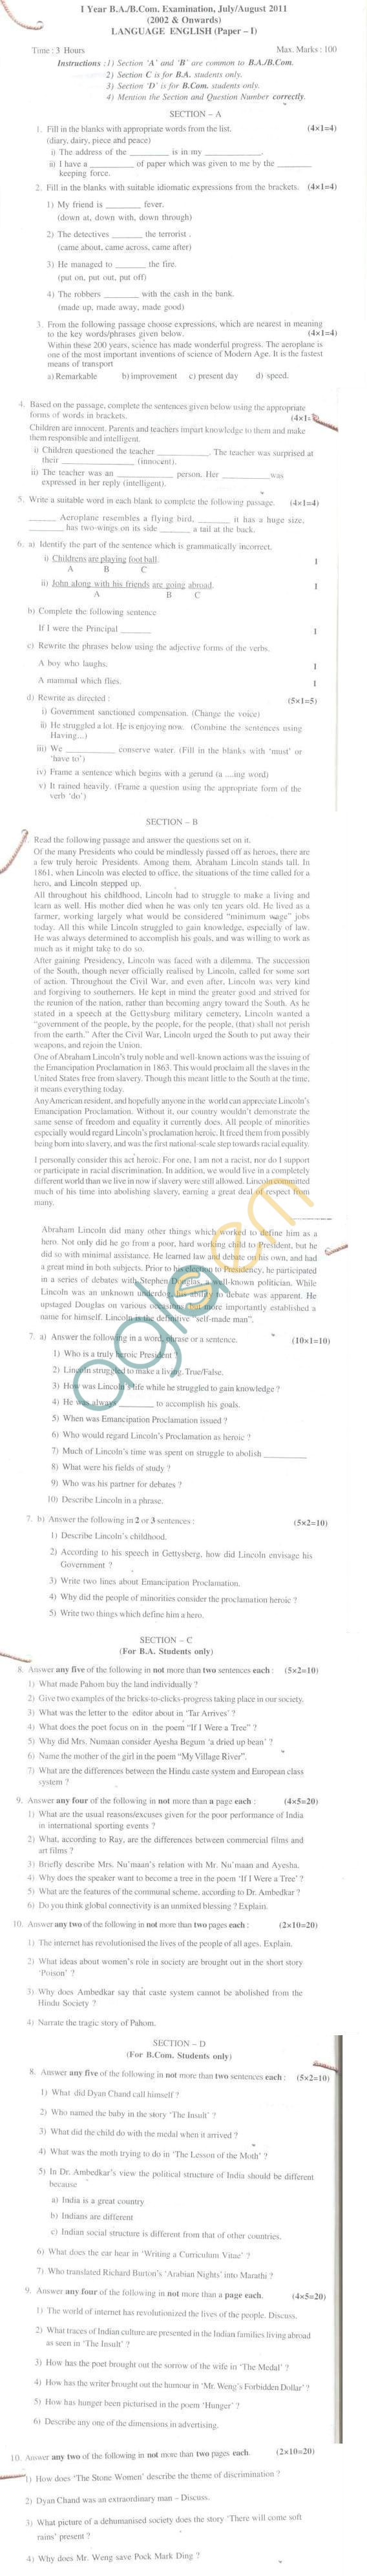 Bangalore University Question Paper July/August 2011 I Year B.A./B.Com. Examination - English